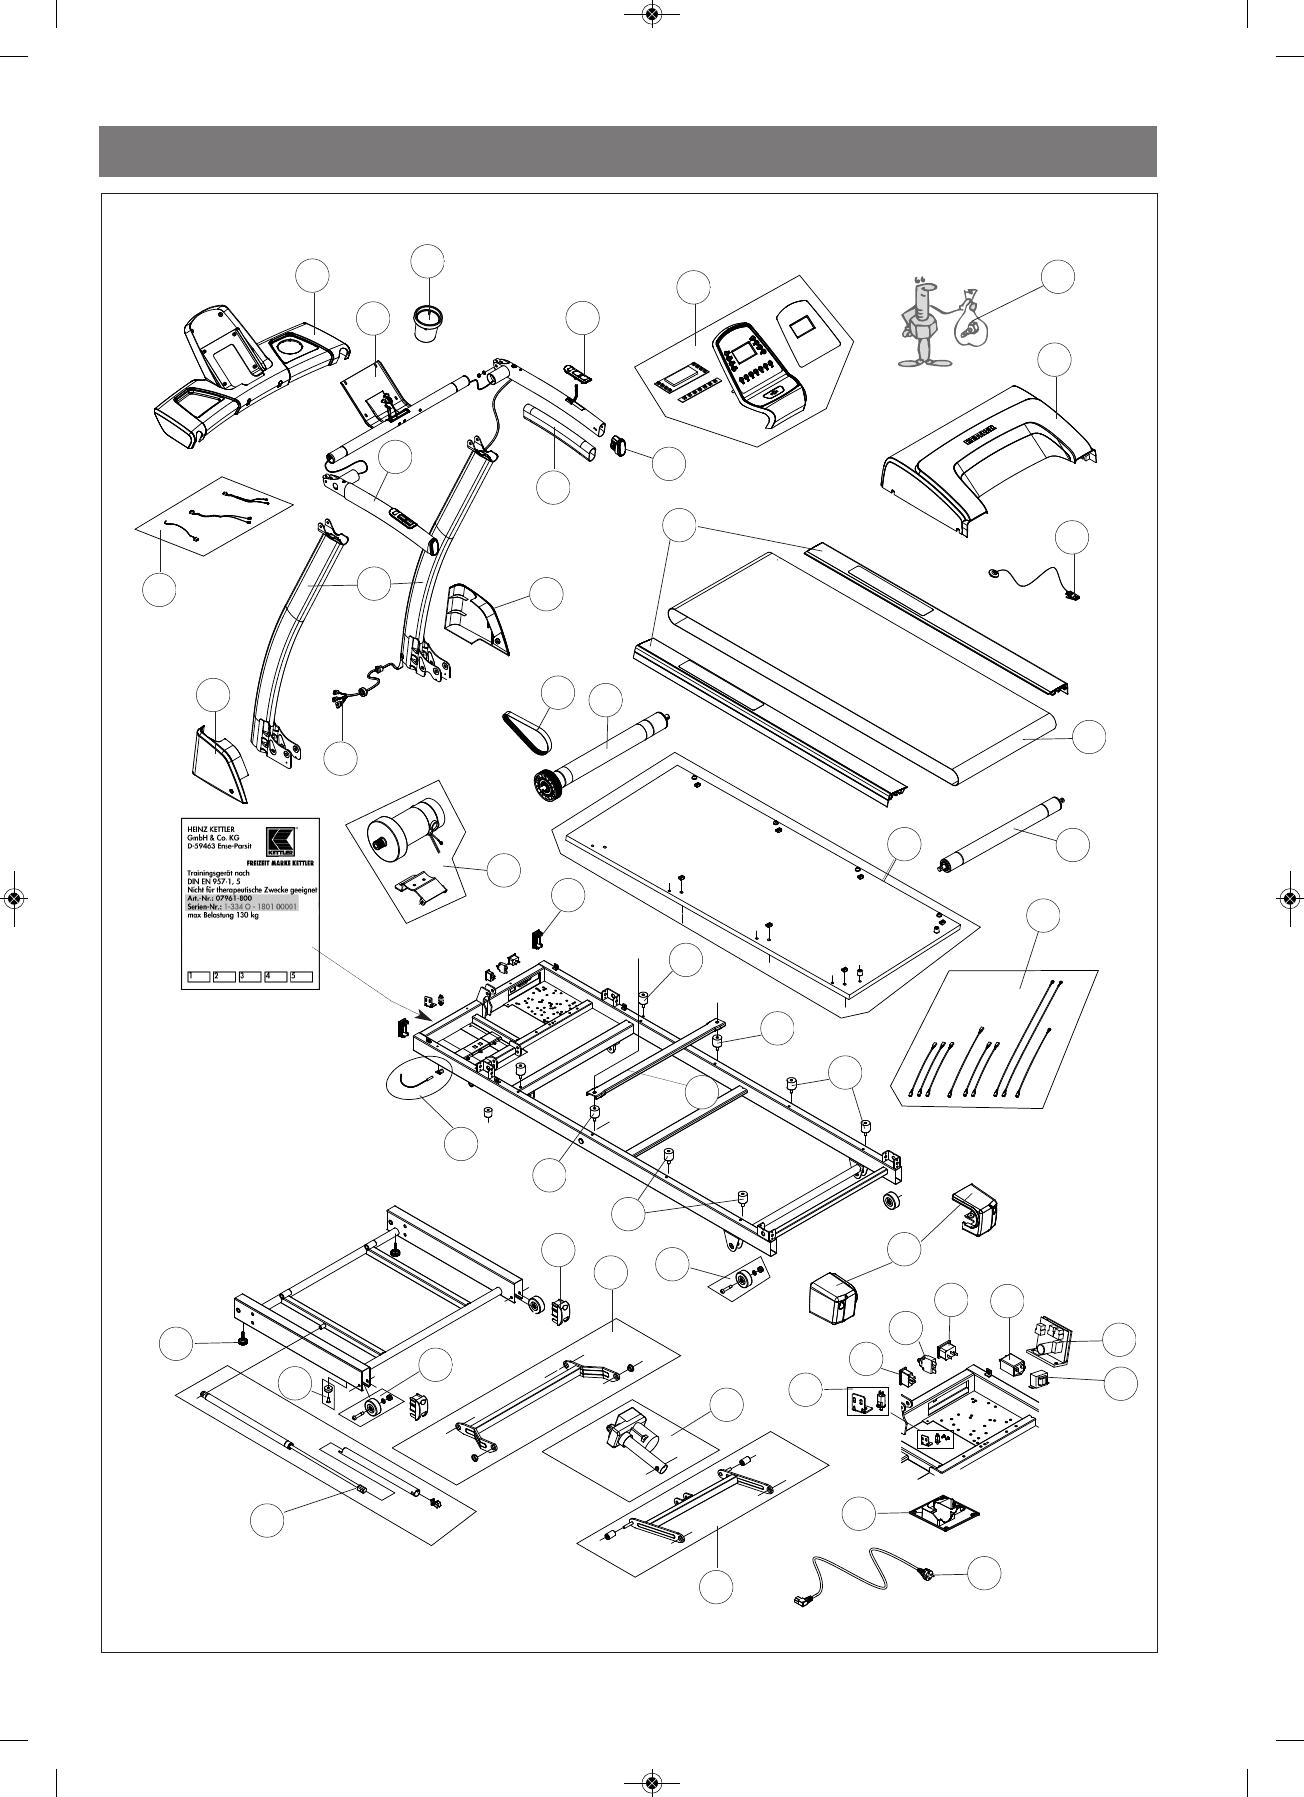 Handleiding Kettler Pacer 07888 000 Pagina 30 Van 34 Dansk